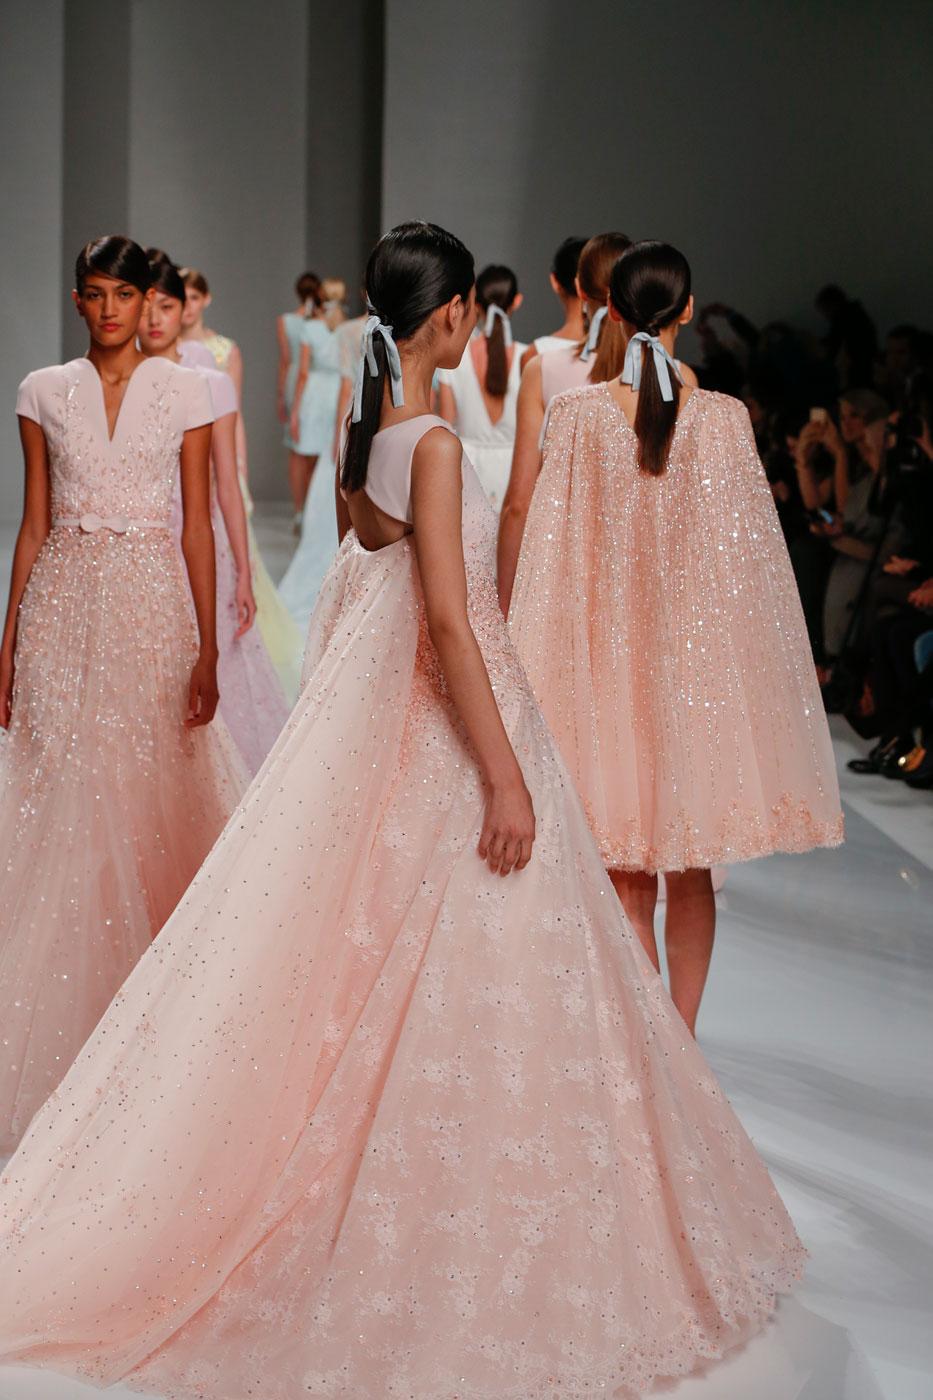 Georges-Hobeika-fashion-runway-show-haute-couture-paris-spring-2015-the-impression-89